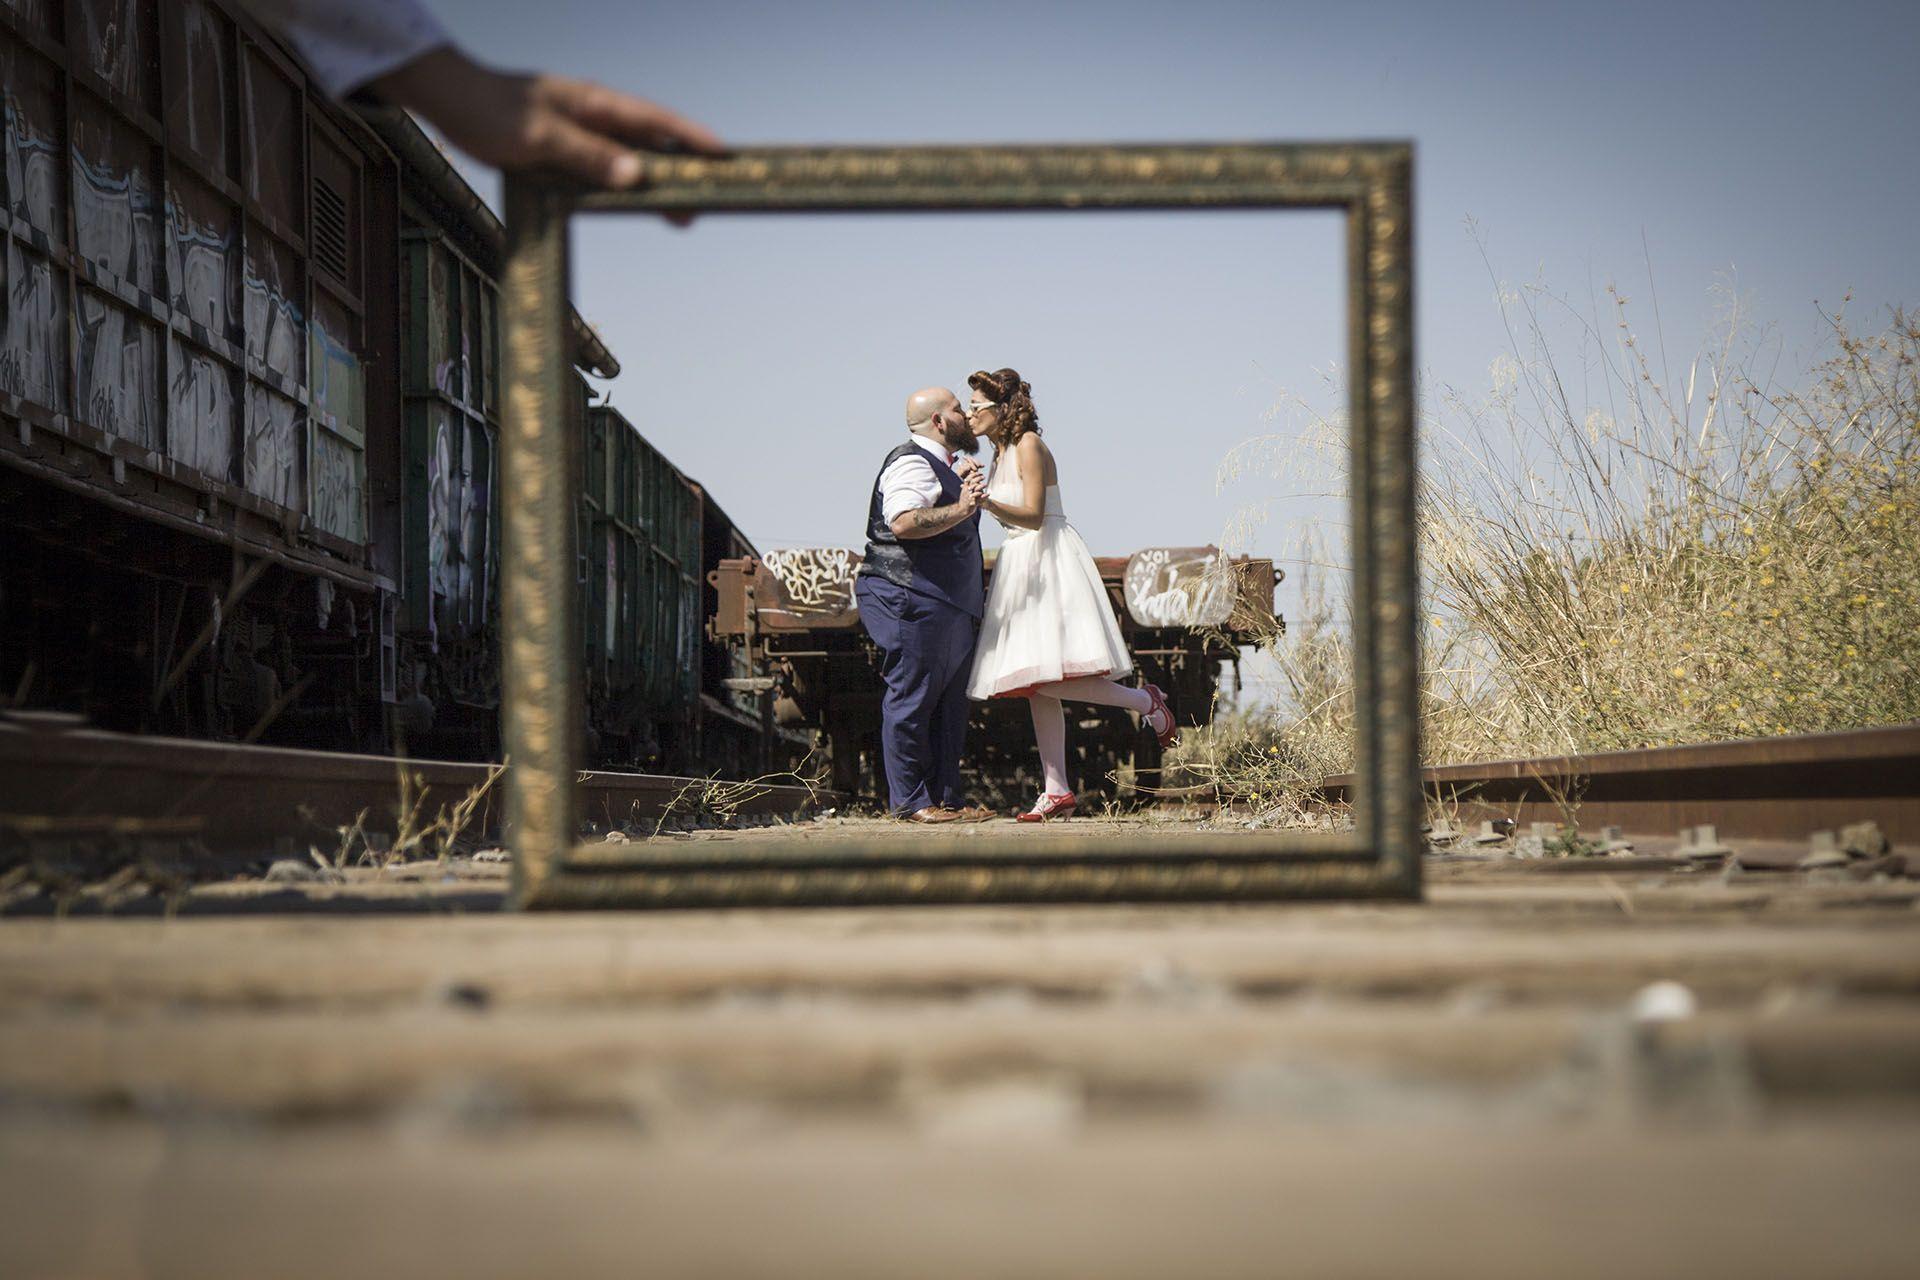 angela coronel-fotografia-bodas-ocaña-aranjuez-gemma pedro